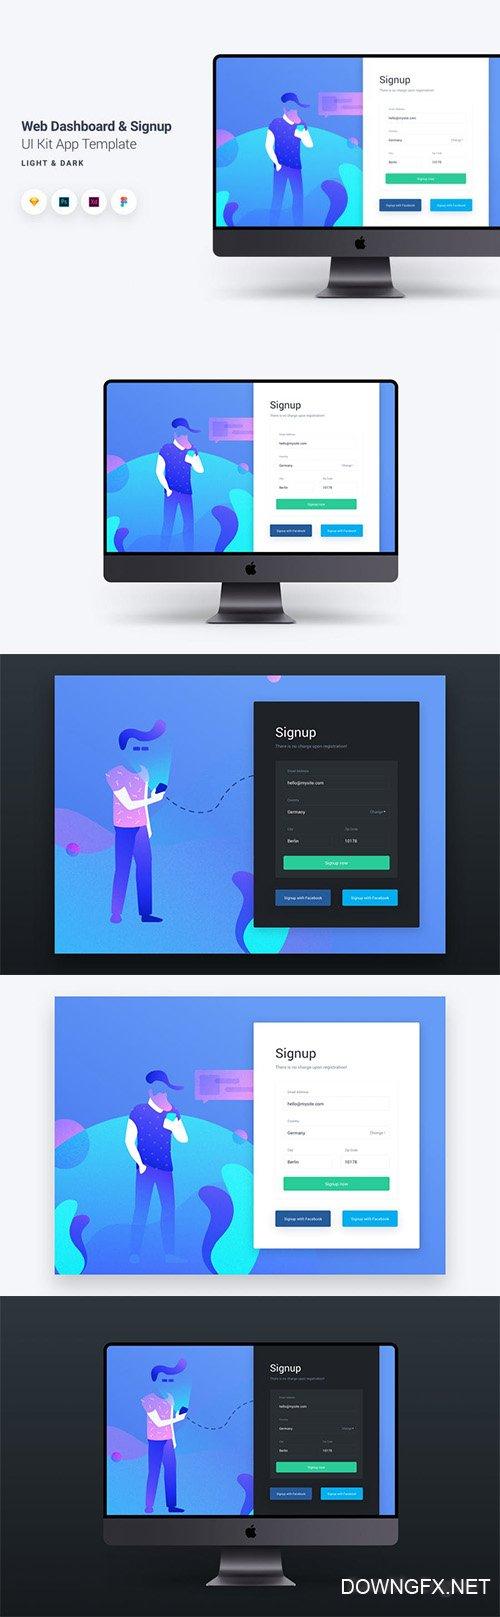 Web Dashboard & Chat UI Kit App Template 9 » DOWNGFX.NET